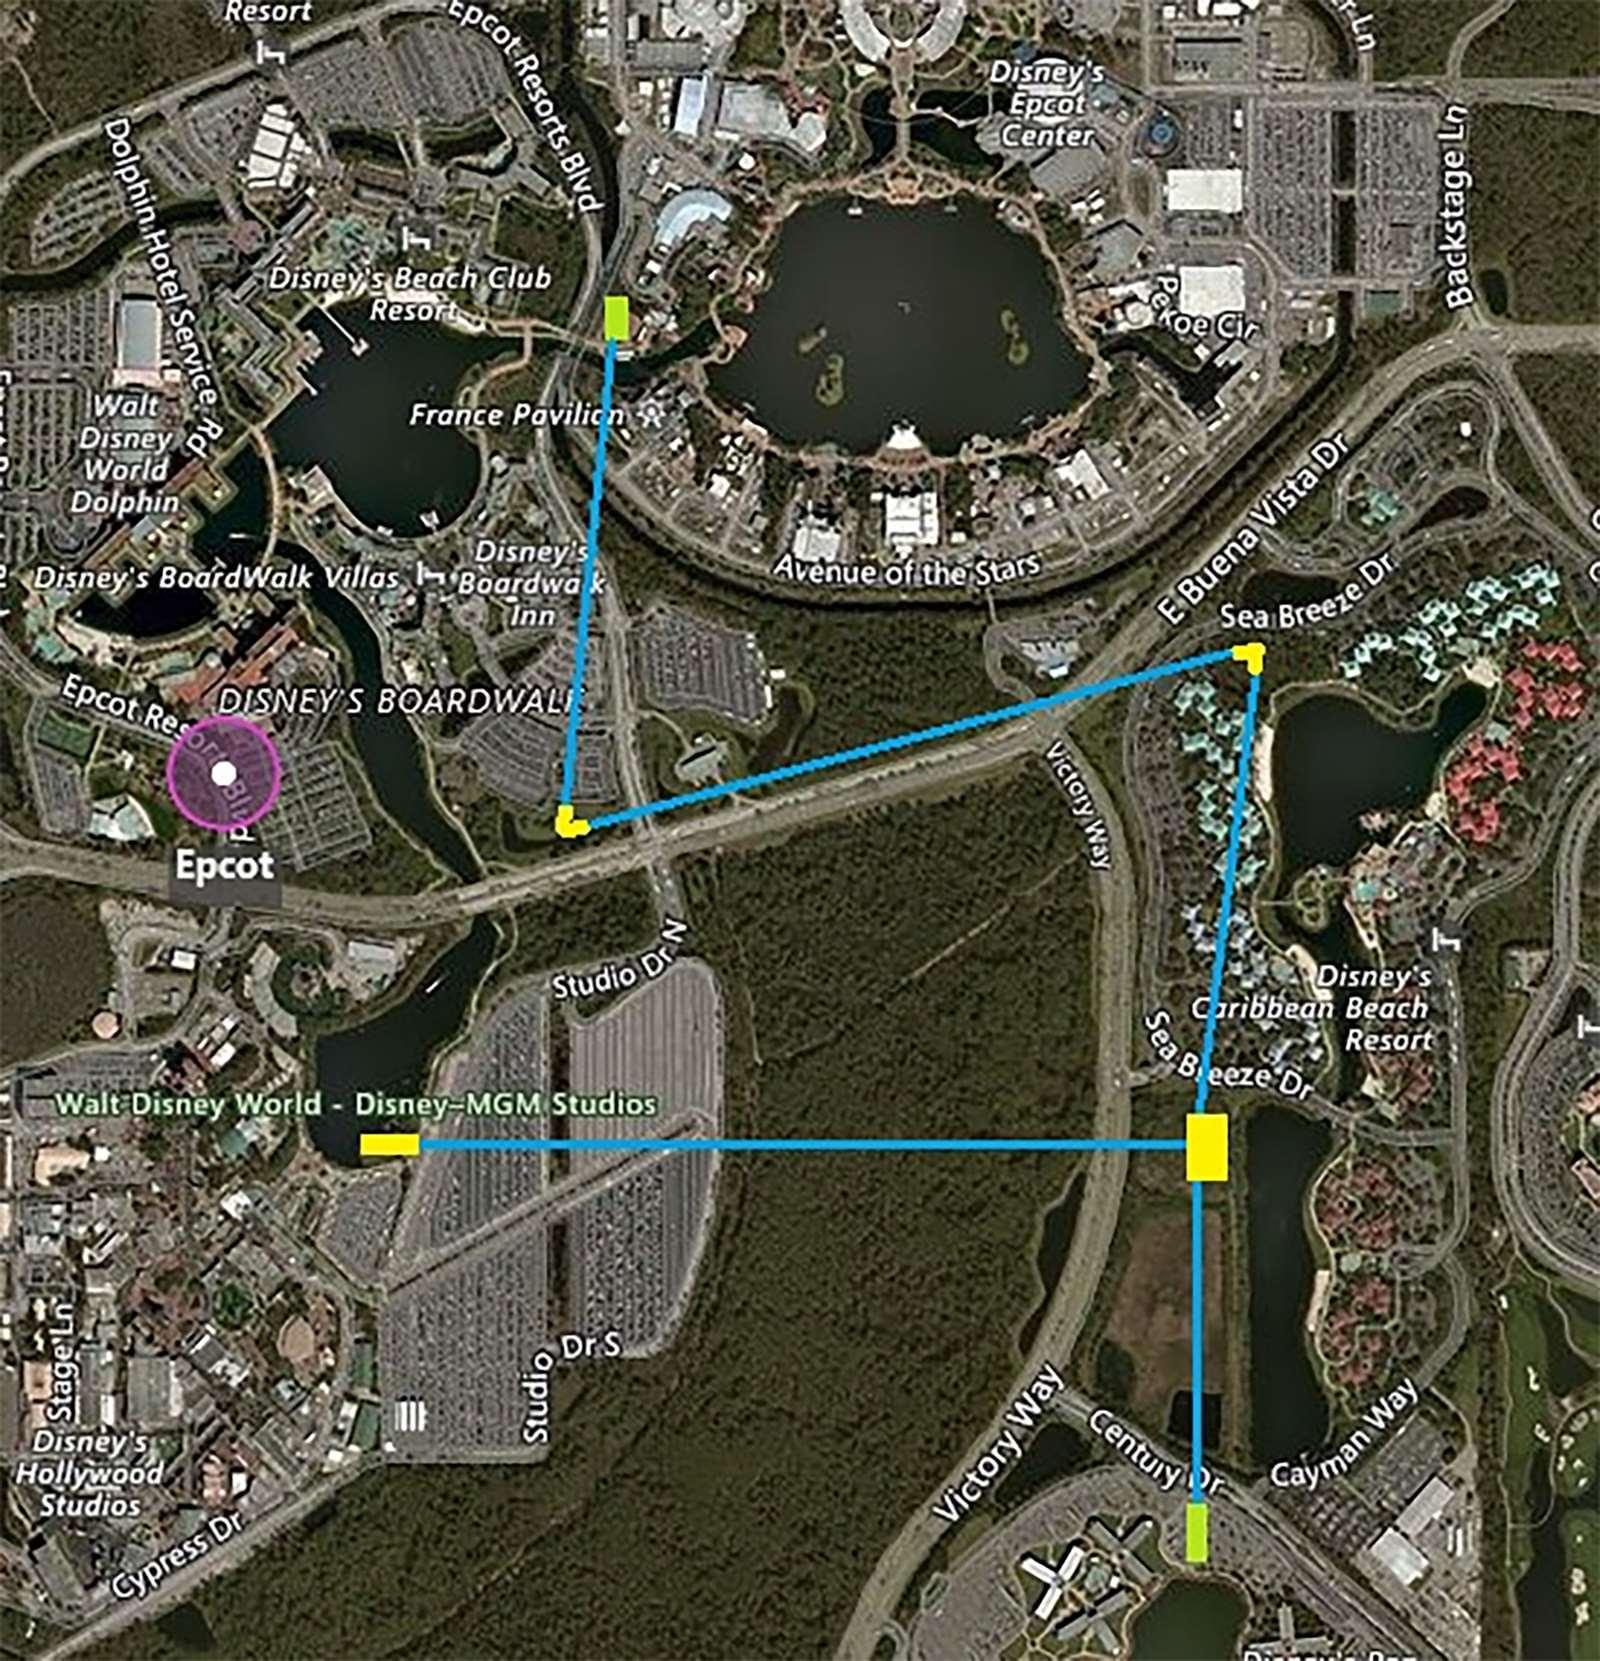 Walt Disney World Gondola map - Photo 1 of 1